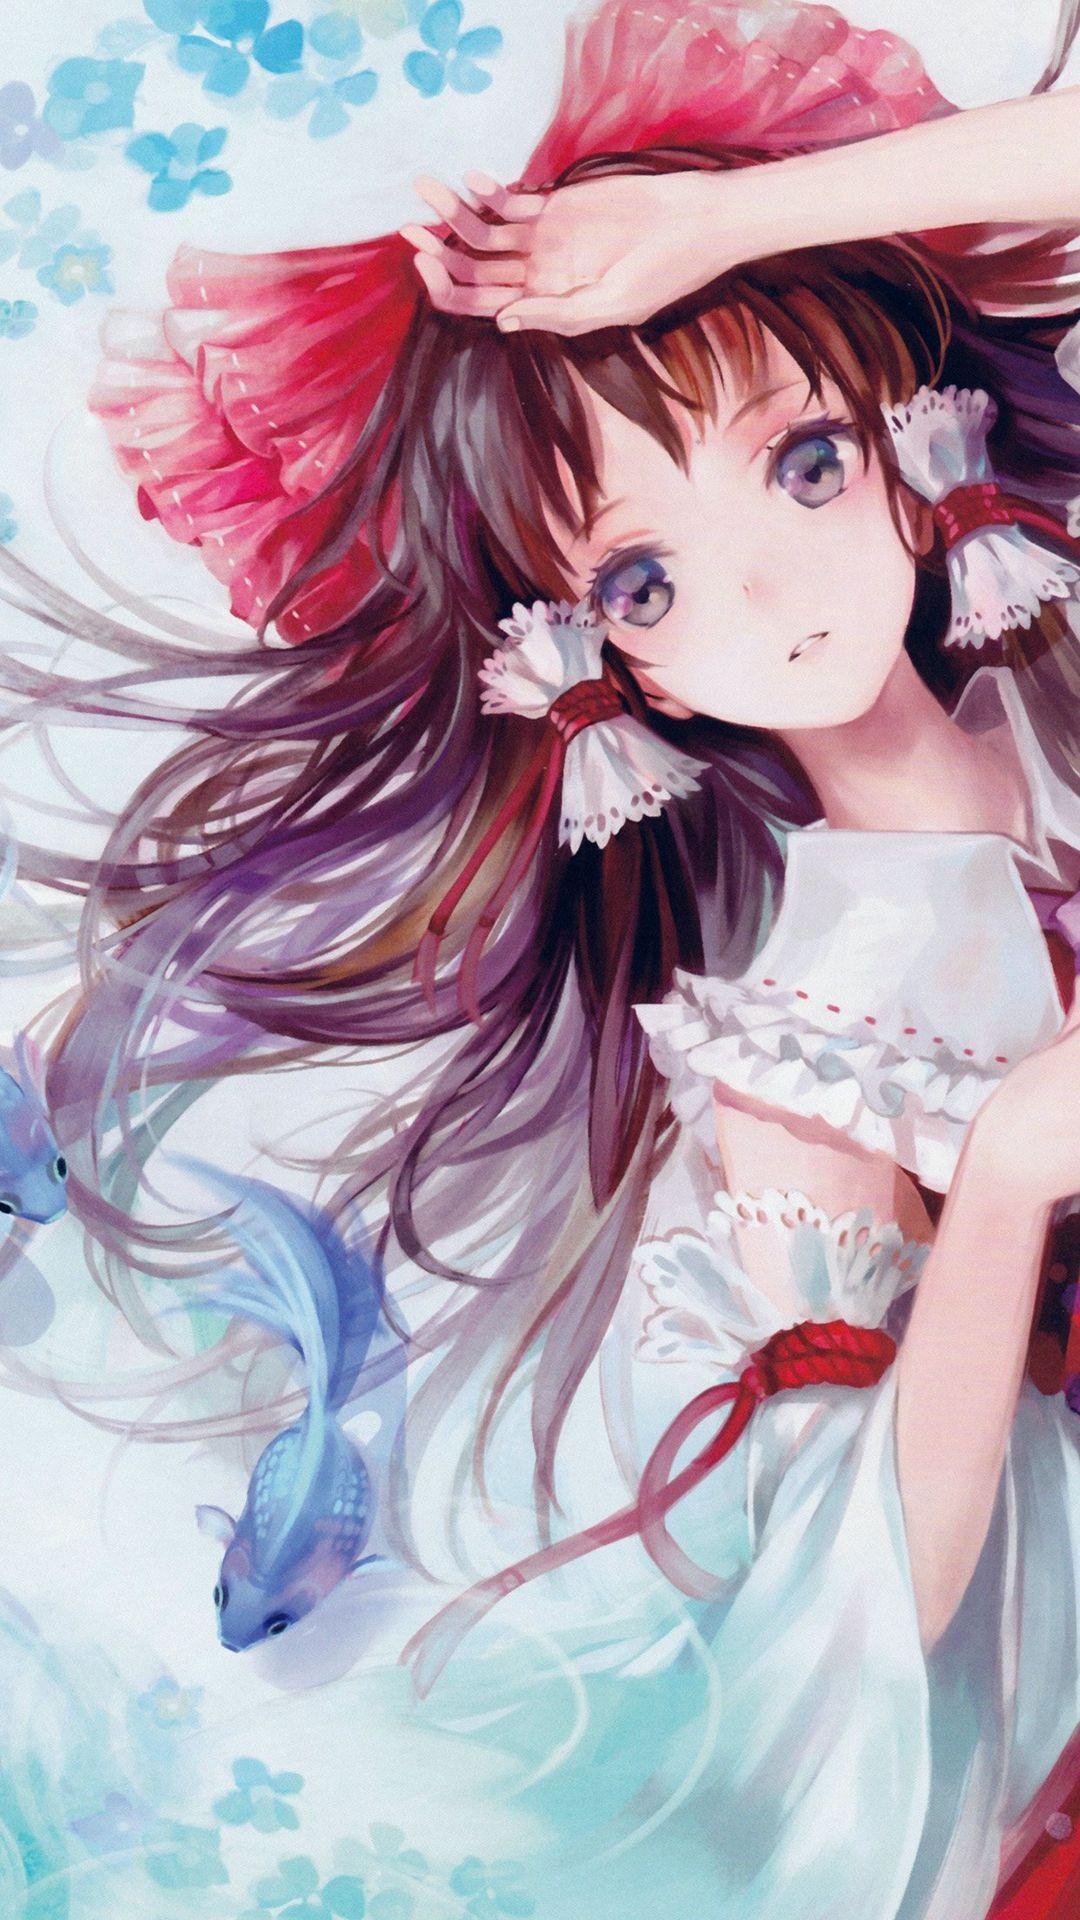 Anime Art Paint Girl Cute iPhone 6 plus wallpaper ศิลปะ